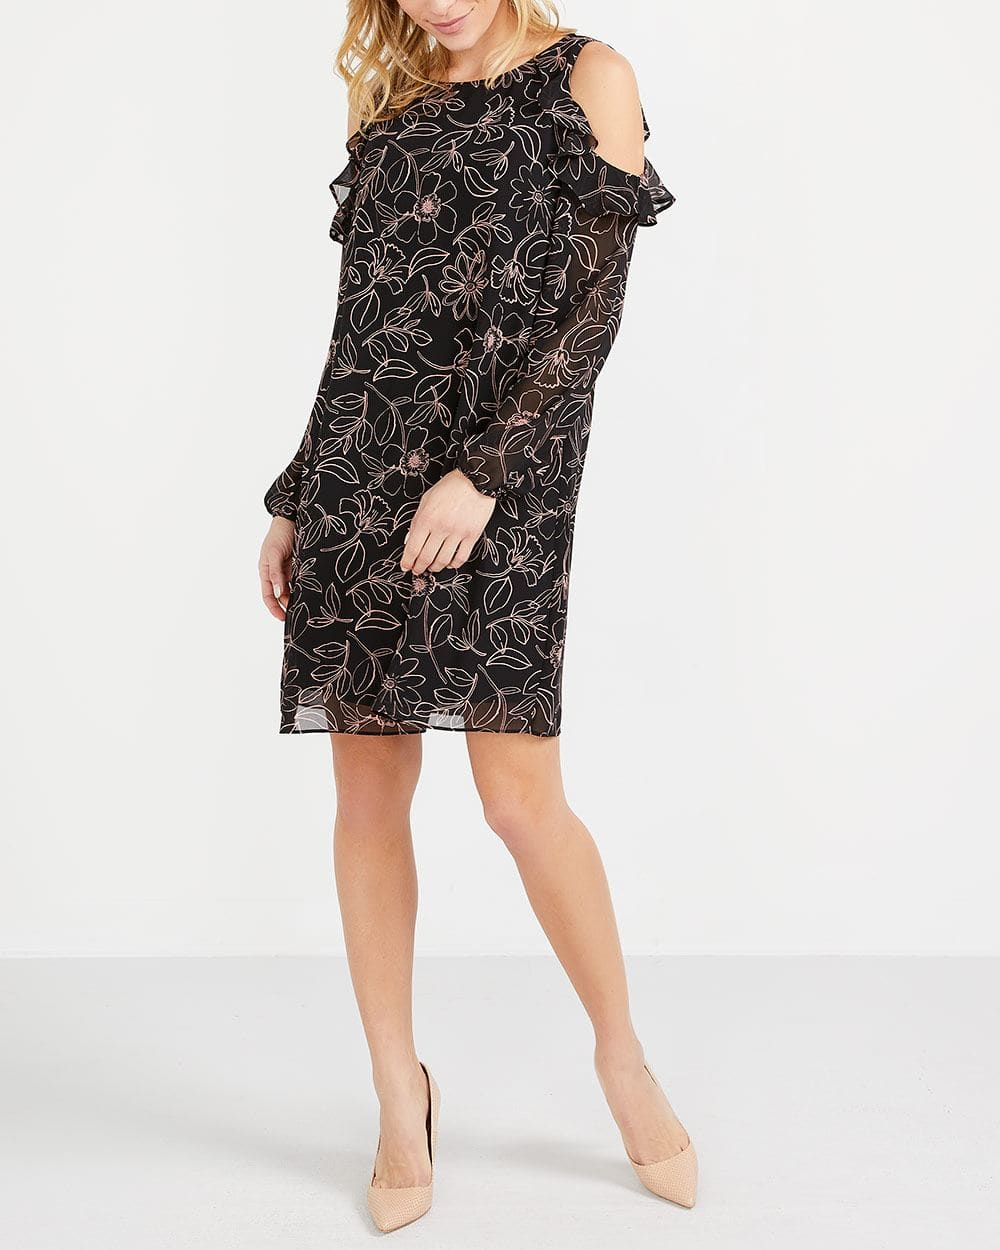 Printed Chiffon Cold-Shoulder Dress